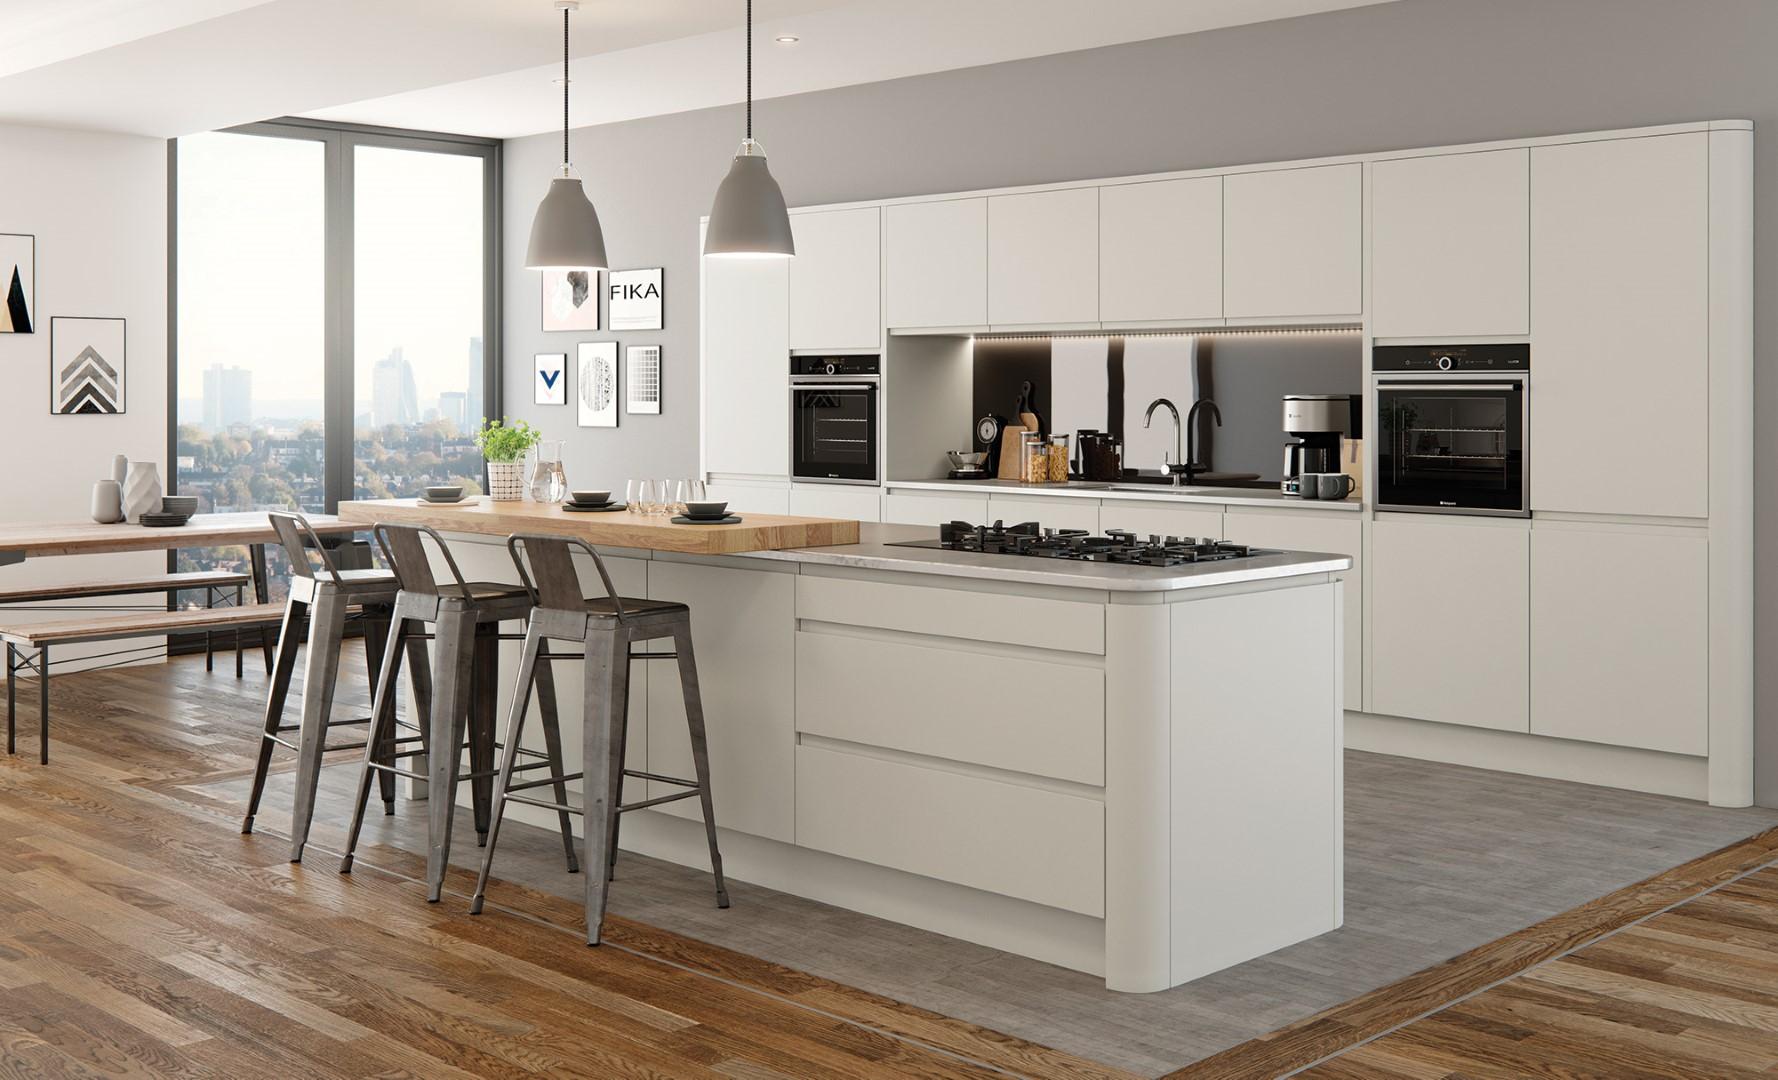 Modern Contemporary Strada Matte Painted Porcelain Kitchen - Kitchen Design - Alan Kelly Kitchens - Waterford